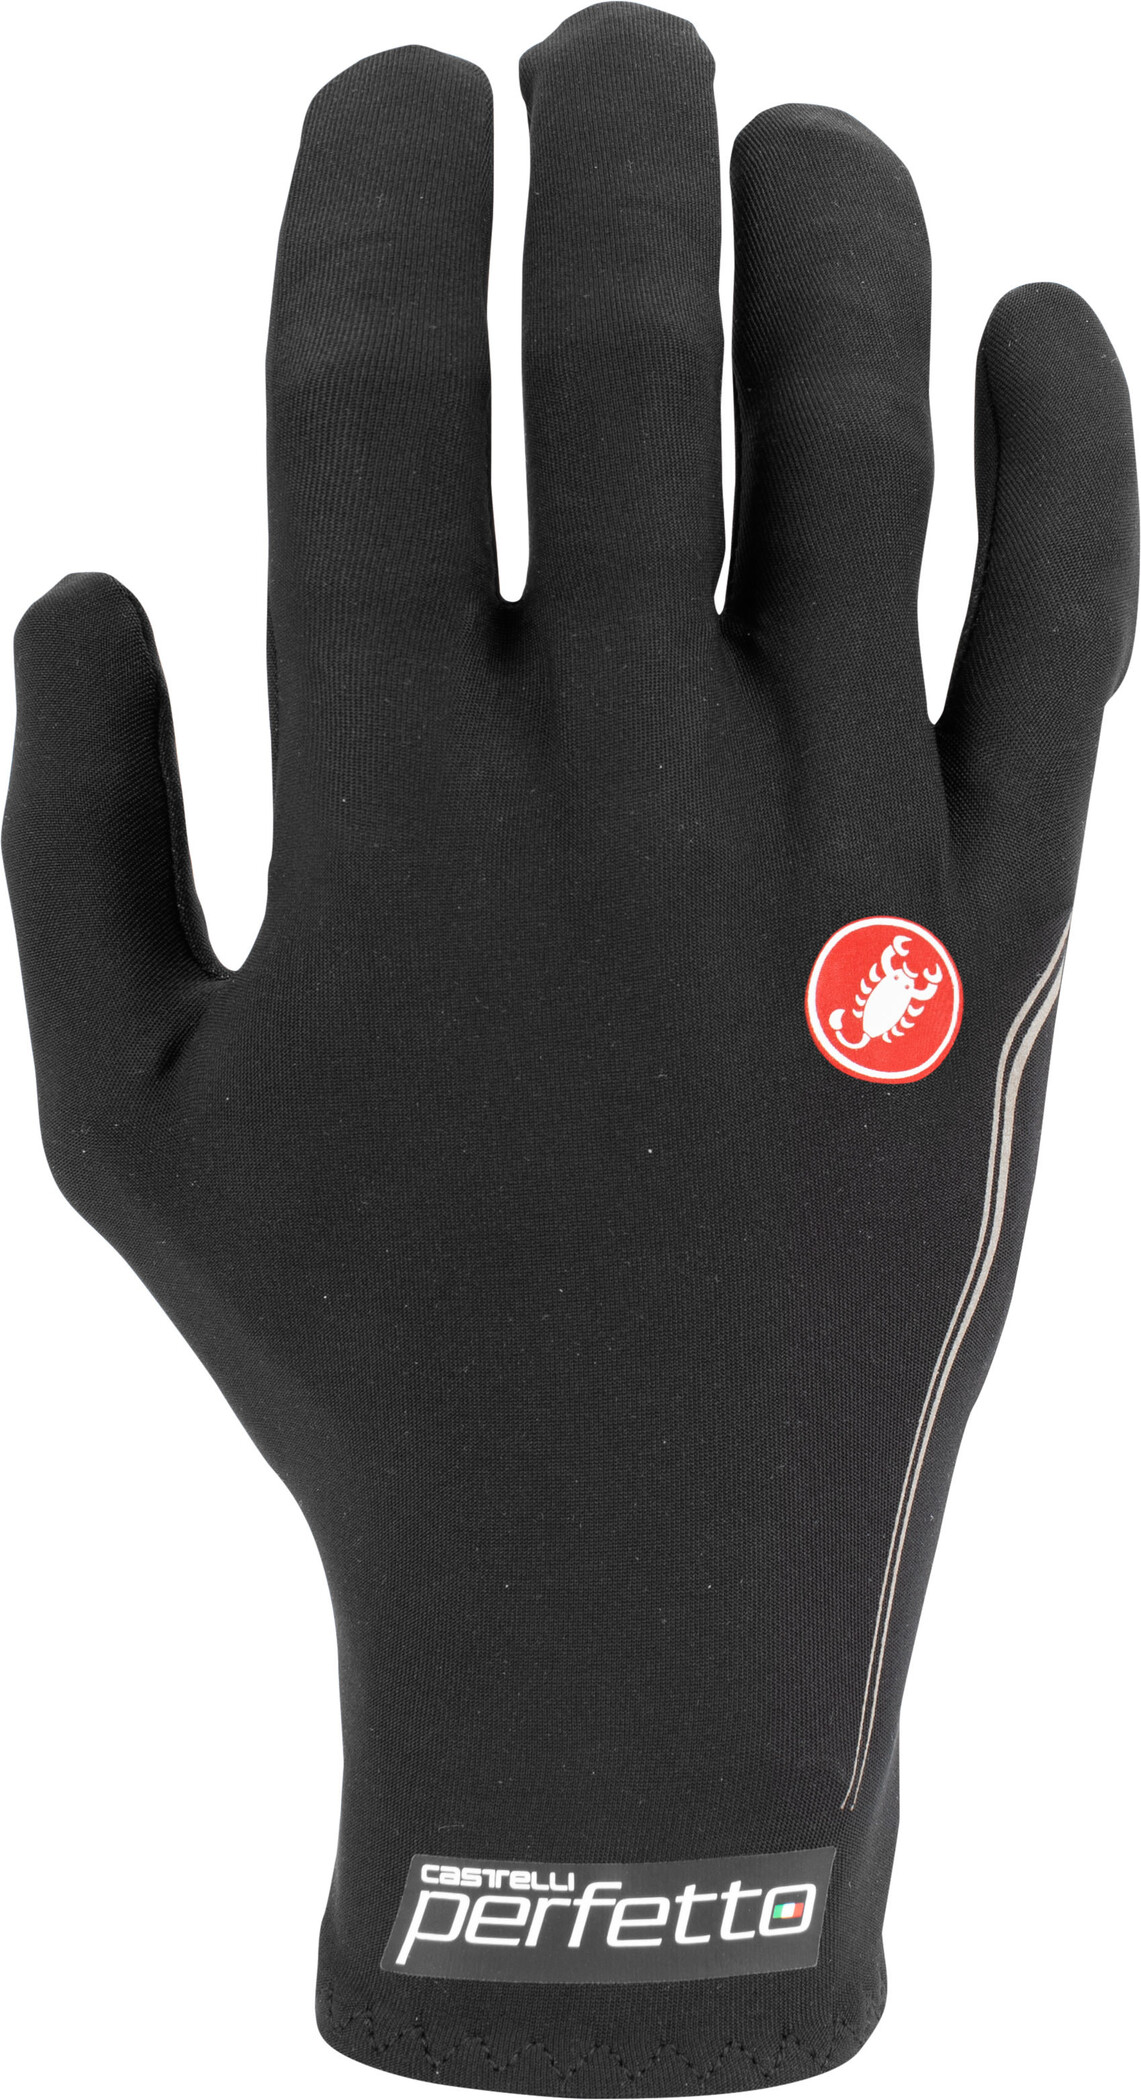 Castelli Perfetto Handsker, black (2019) | Gloves